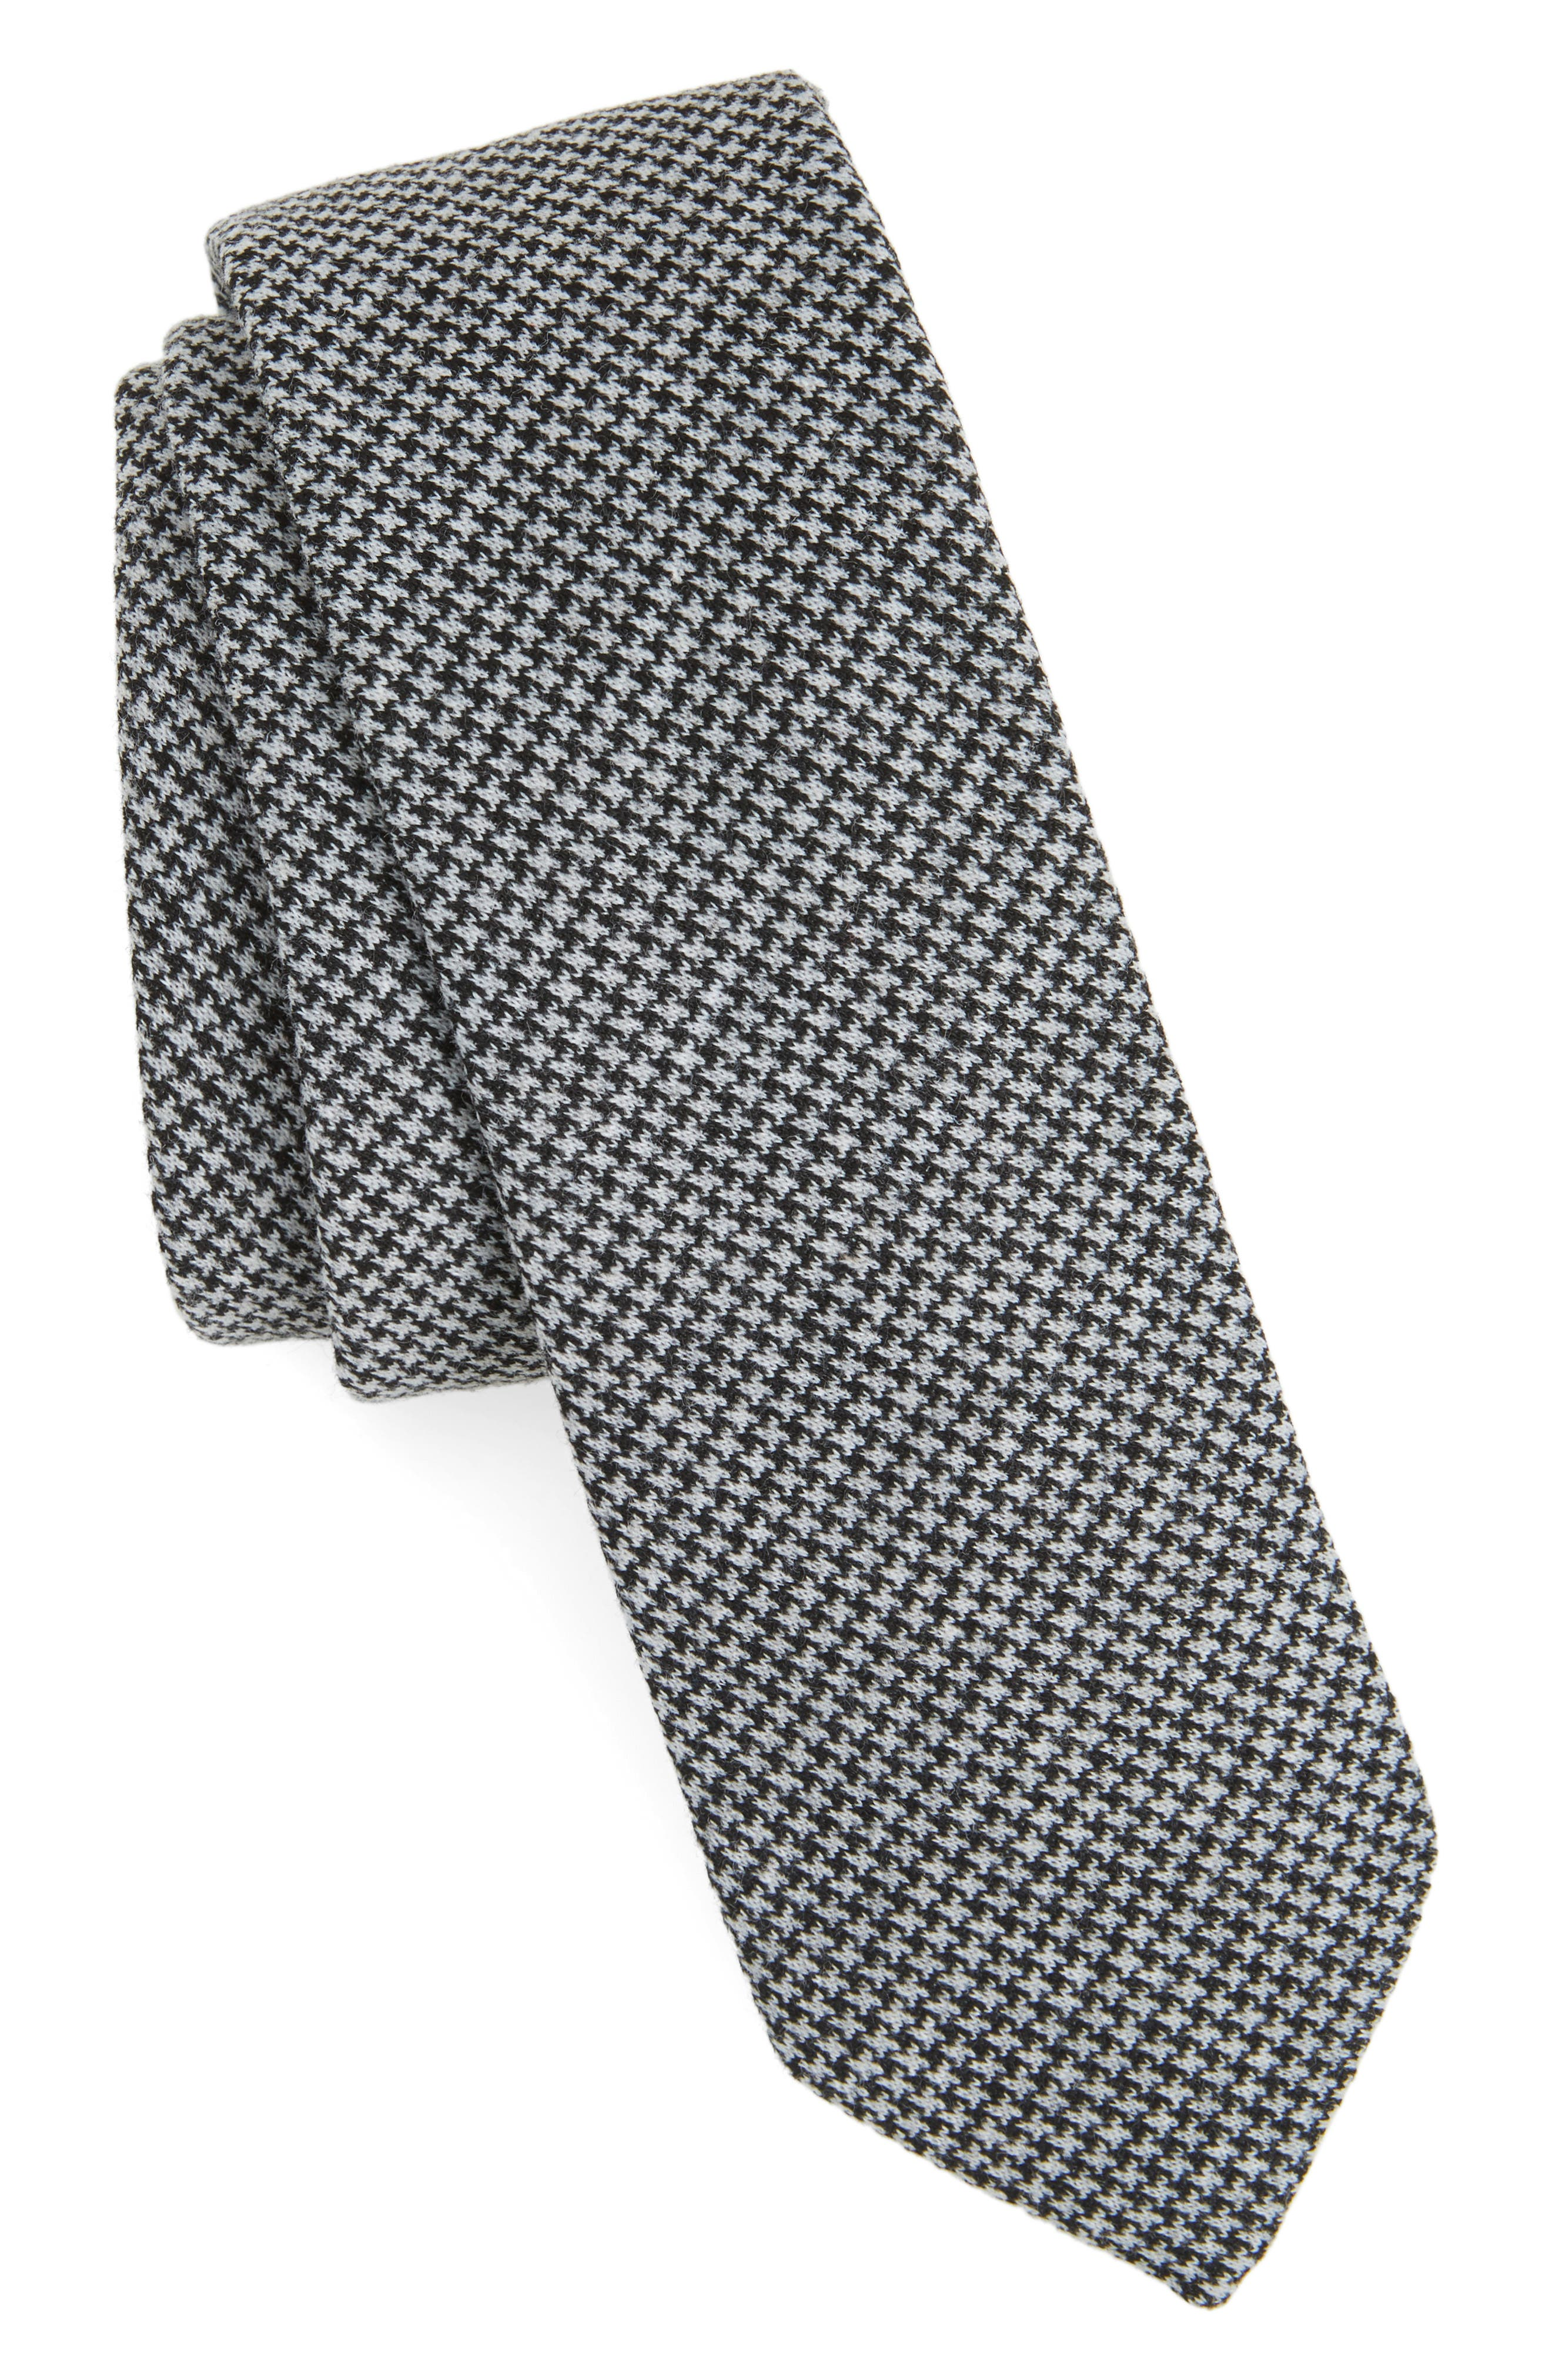 1901 Walton Houndstooth Skinny Tie